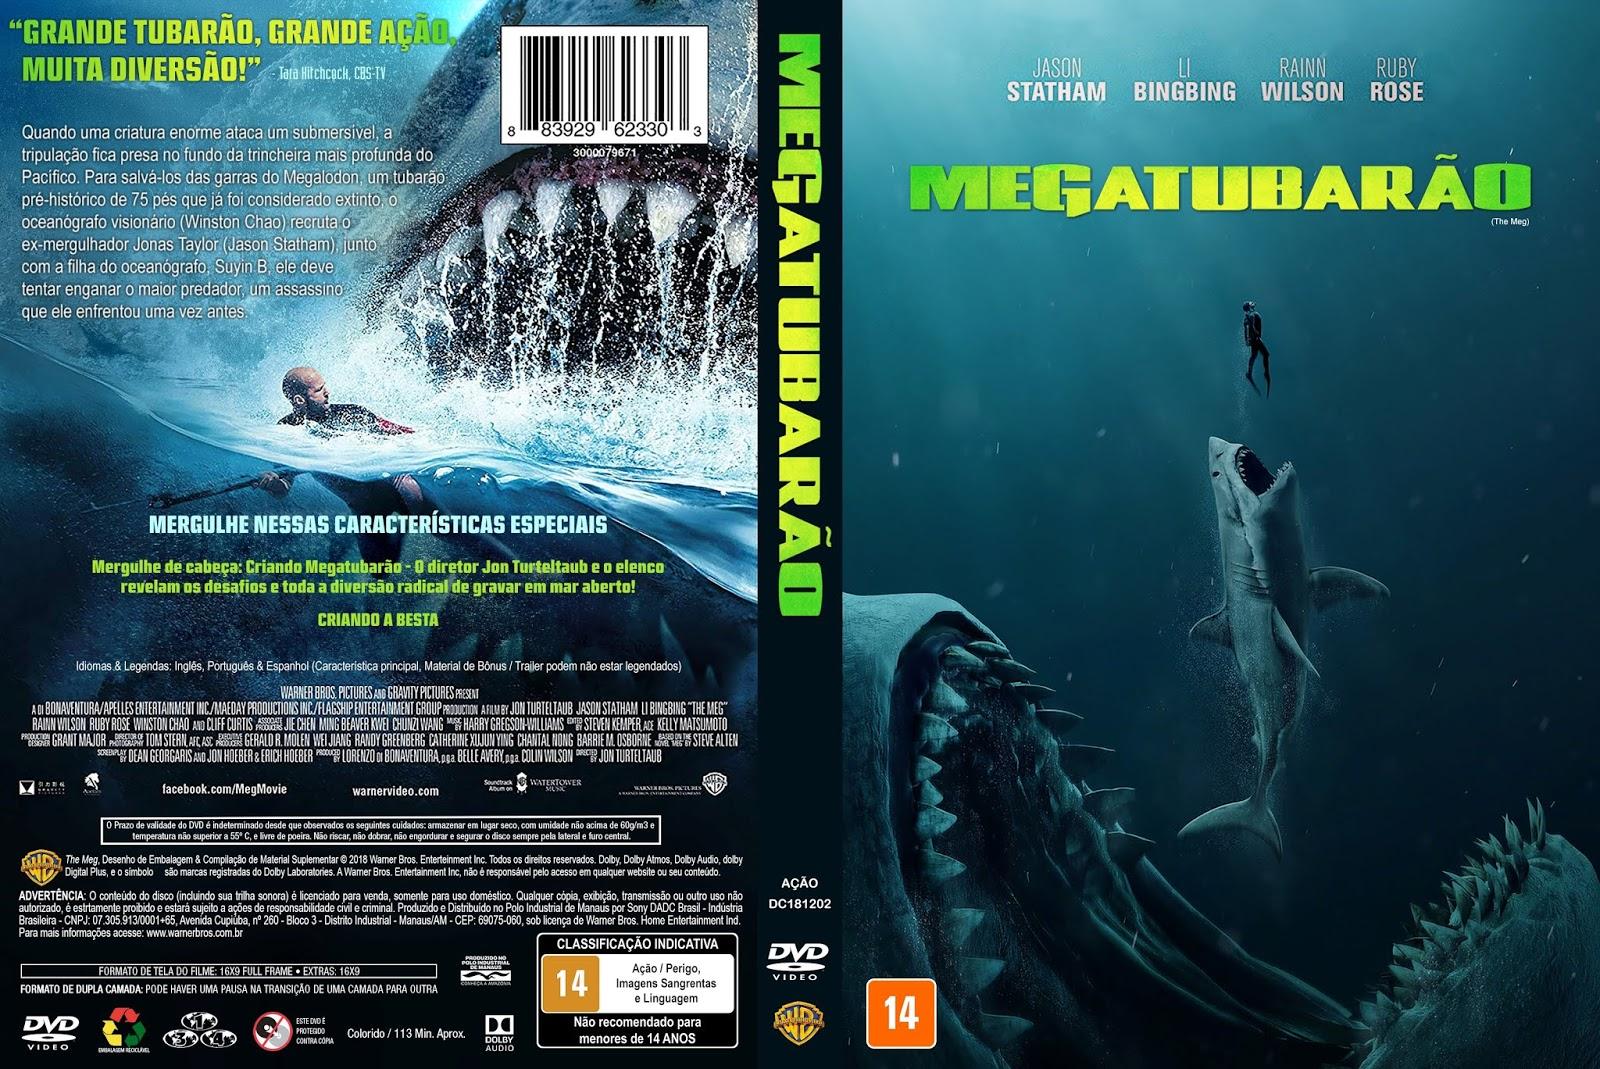 CAPA-DVD-FILME-Megatubar%25C3%25A3o%2B-%